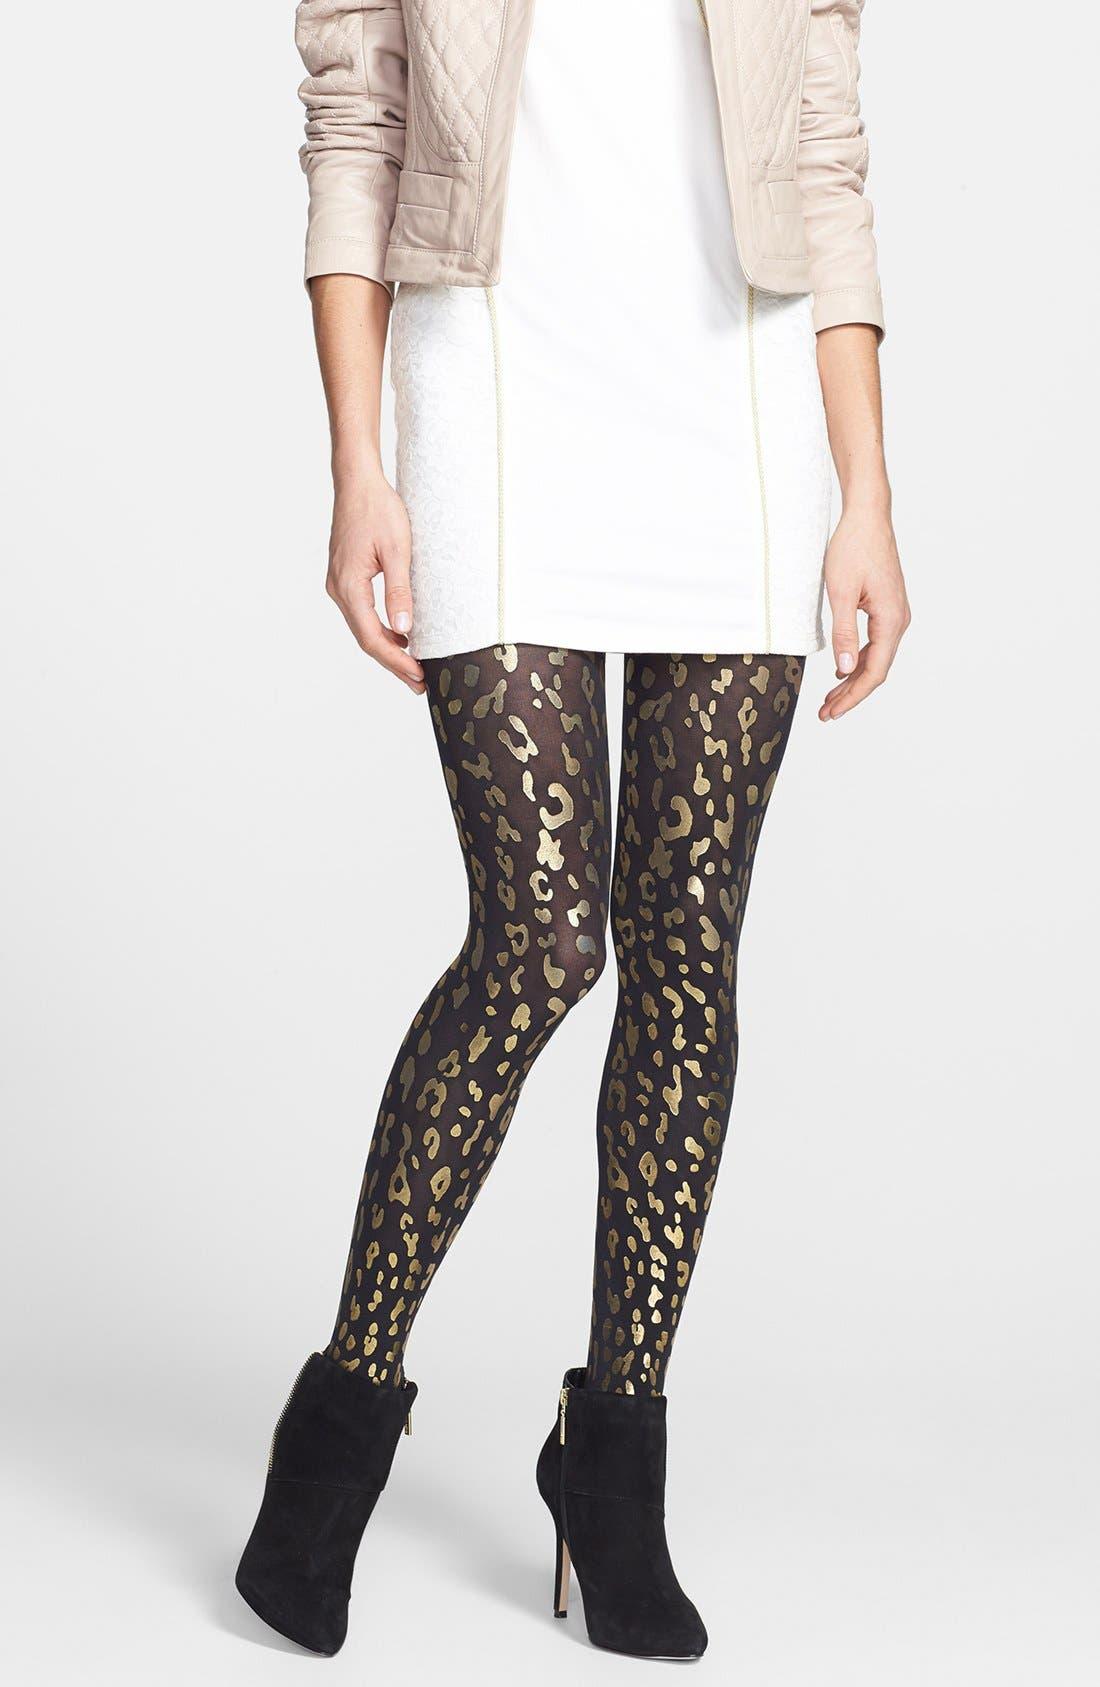 'Leopard' Metallic Foil Tights,                         Main,                         color, Black